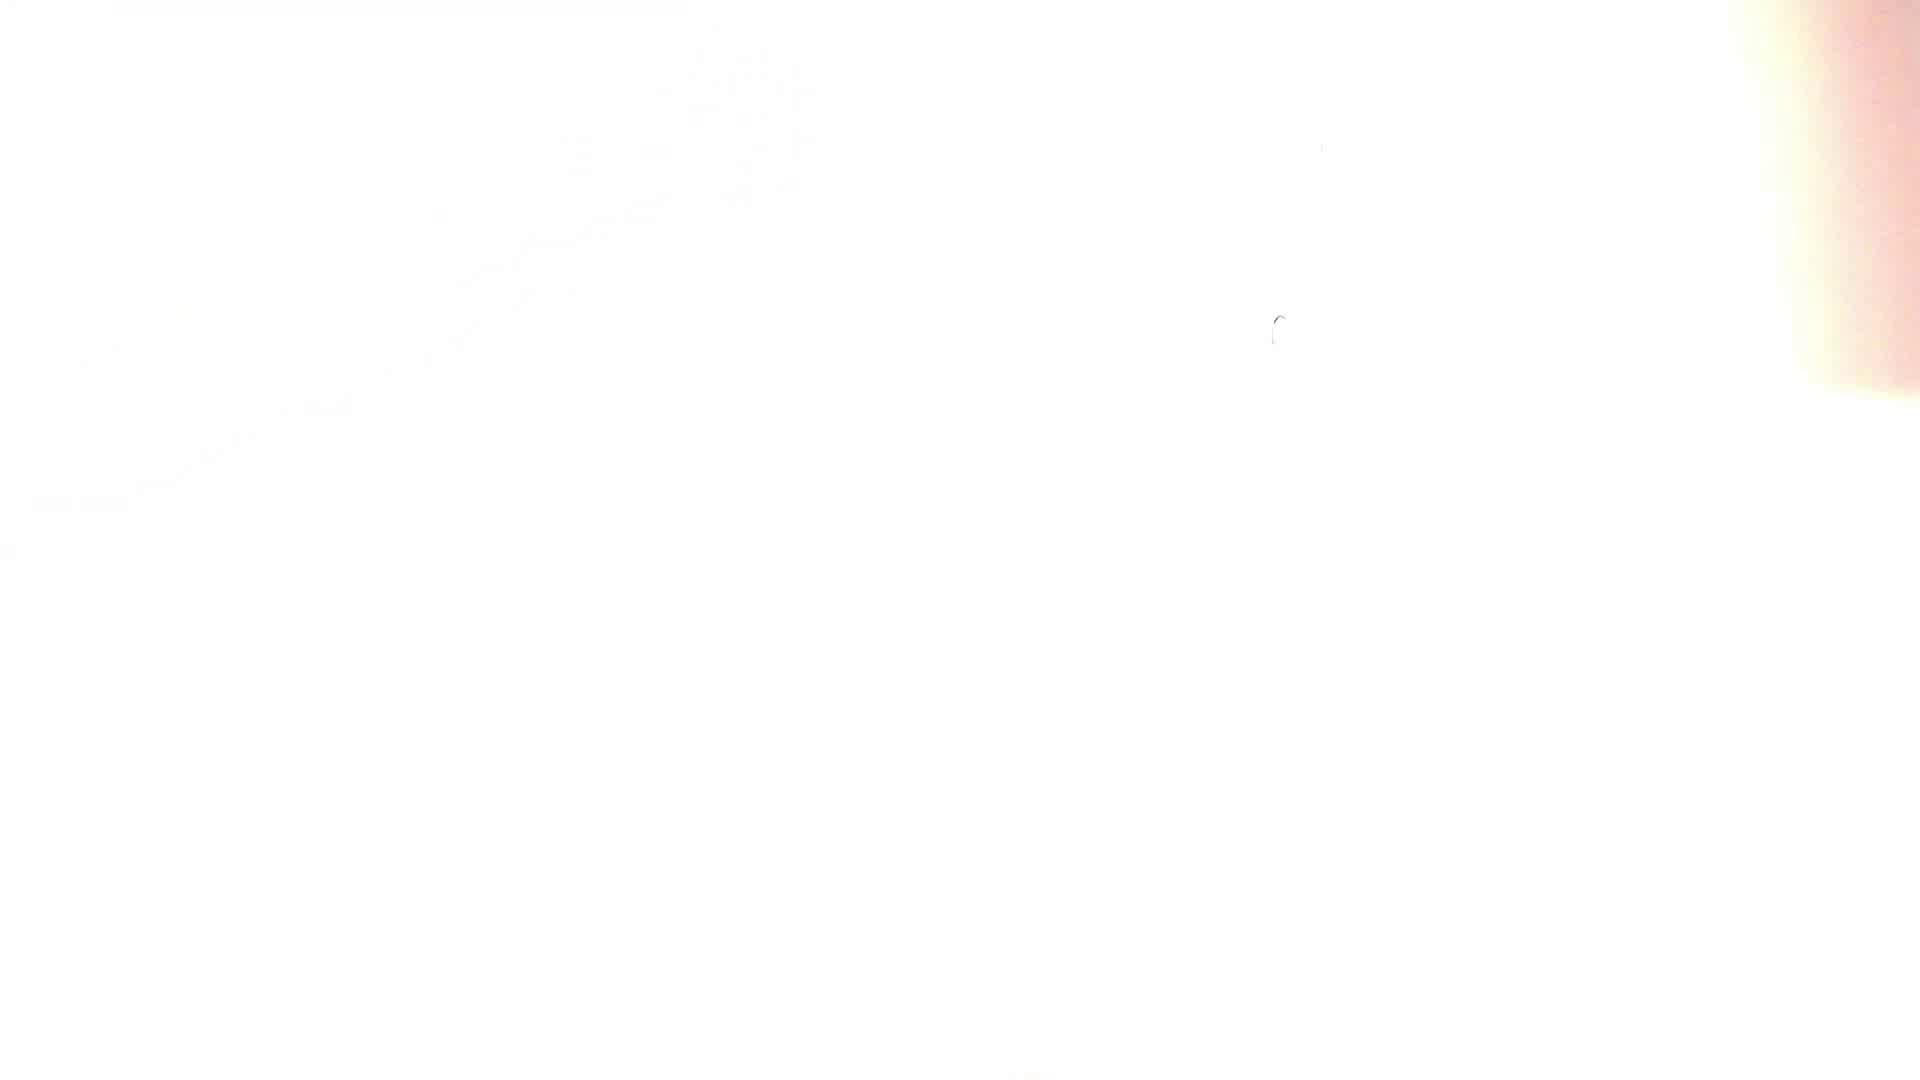 上級者の方専用 vol.07 OL女体  76連発 4